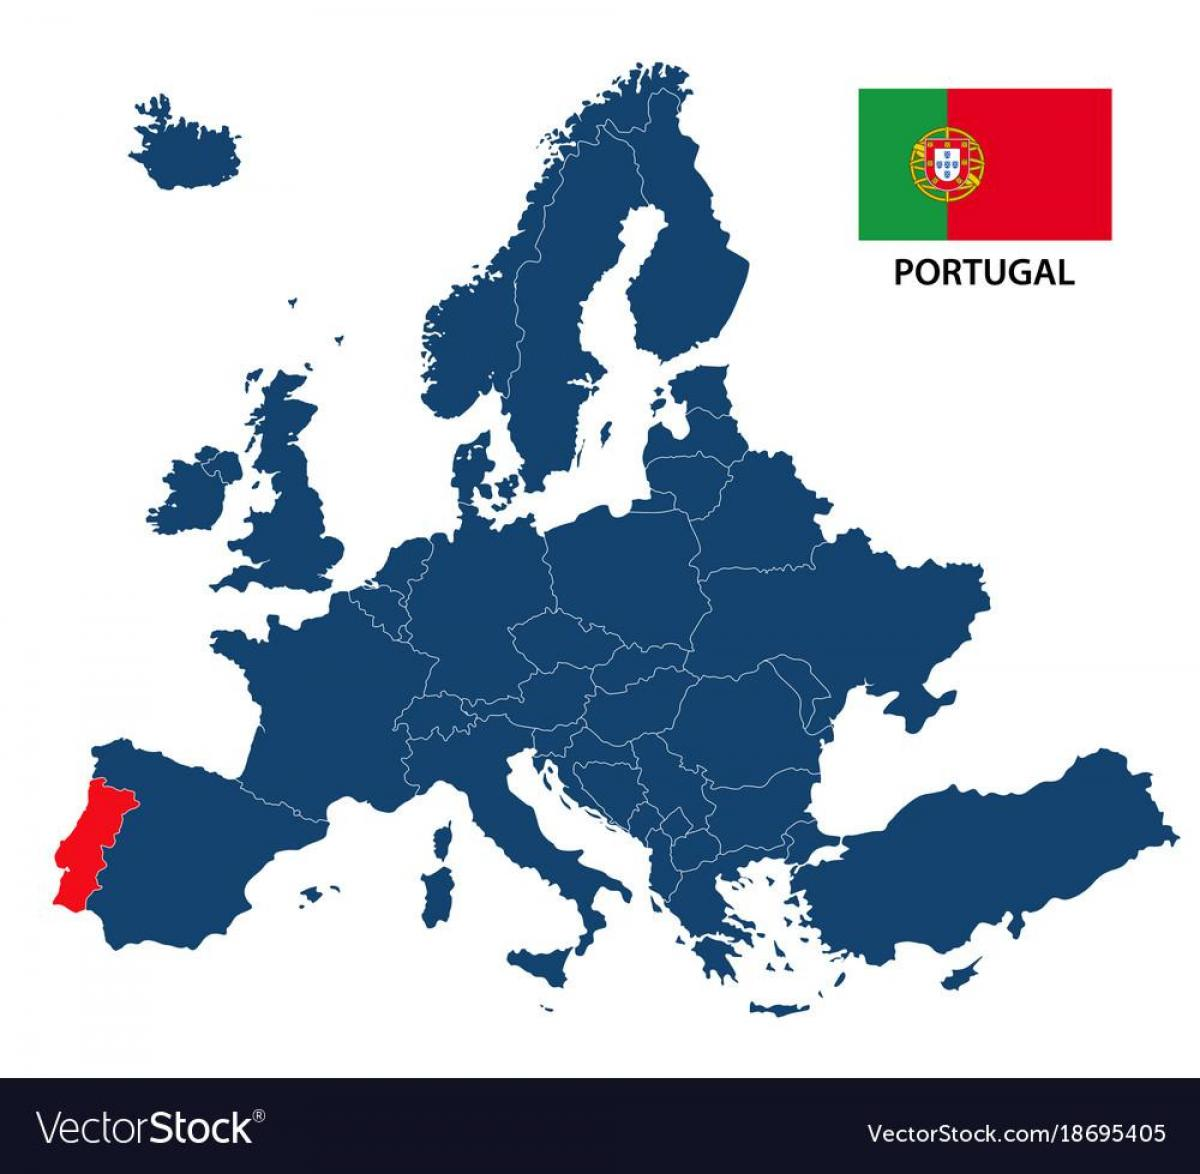 portugal na europa mapa Europa mapa Portugal   Mapa Portugal Europan (Hegoaldeko Europa  portugal na europa mapa